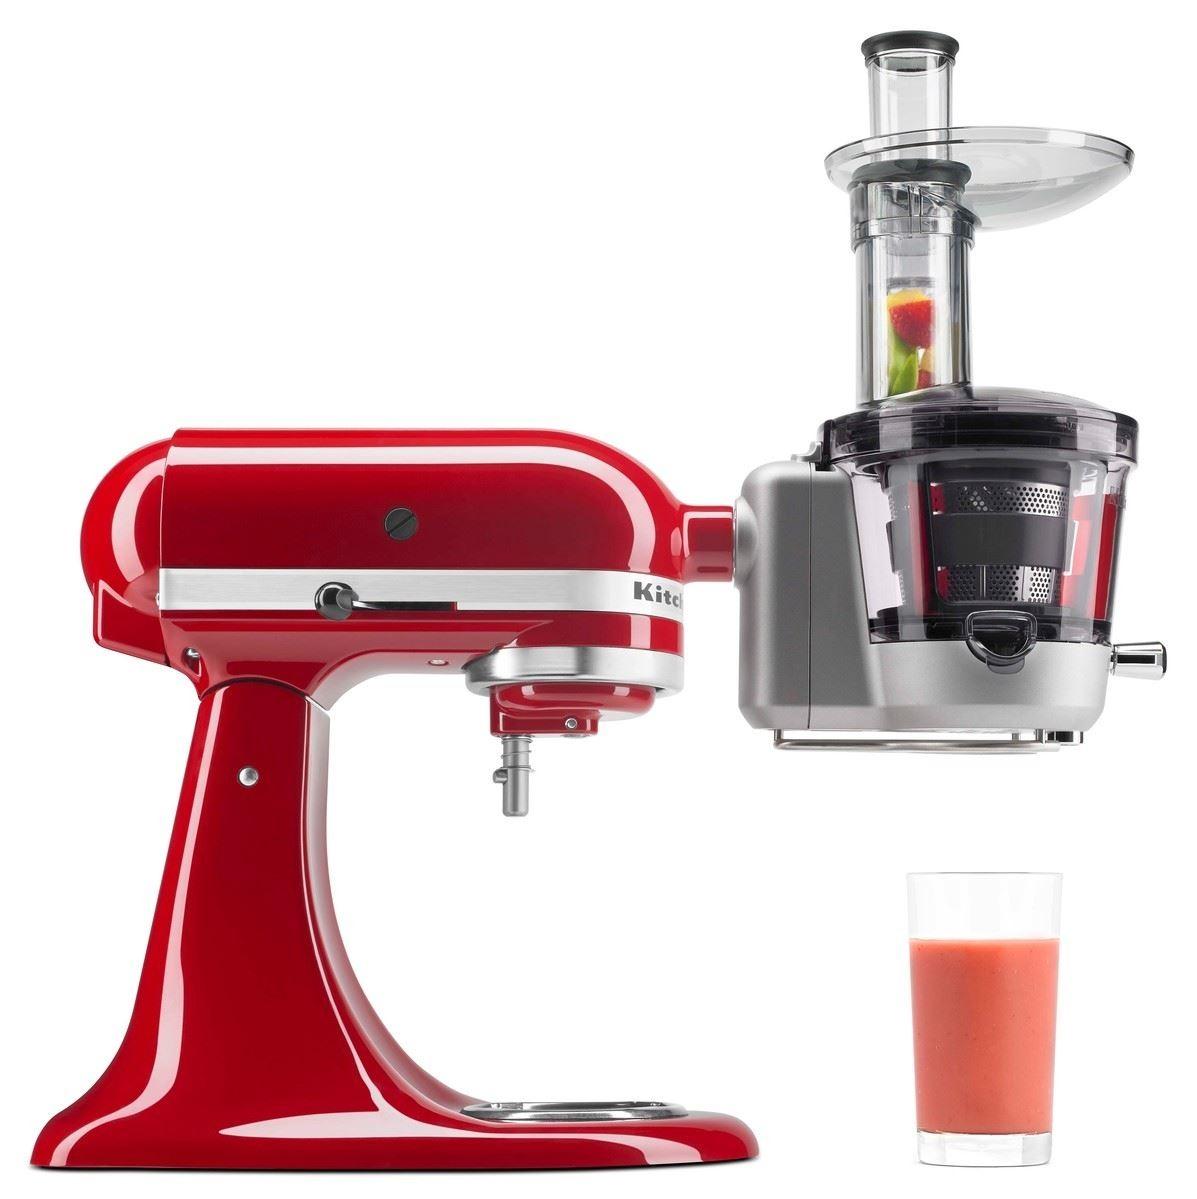 KitchenAid Entsafter-Aufsatz Slow Juicer